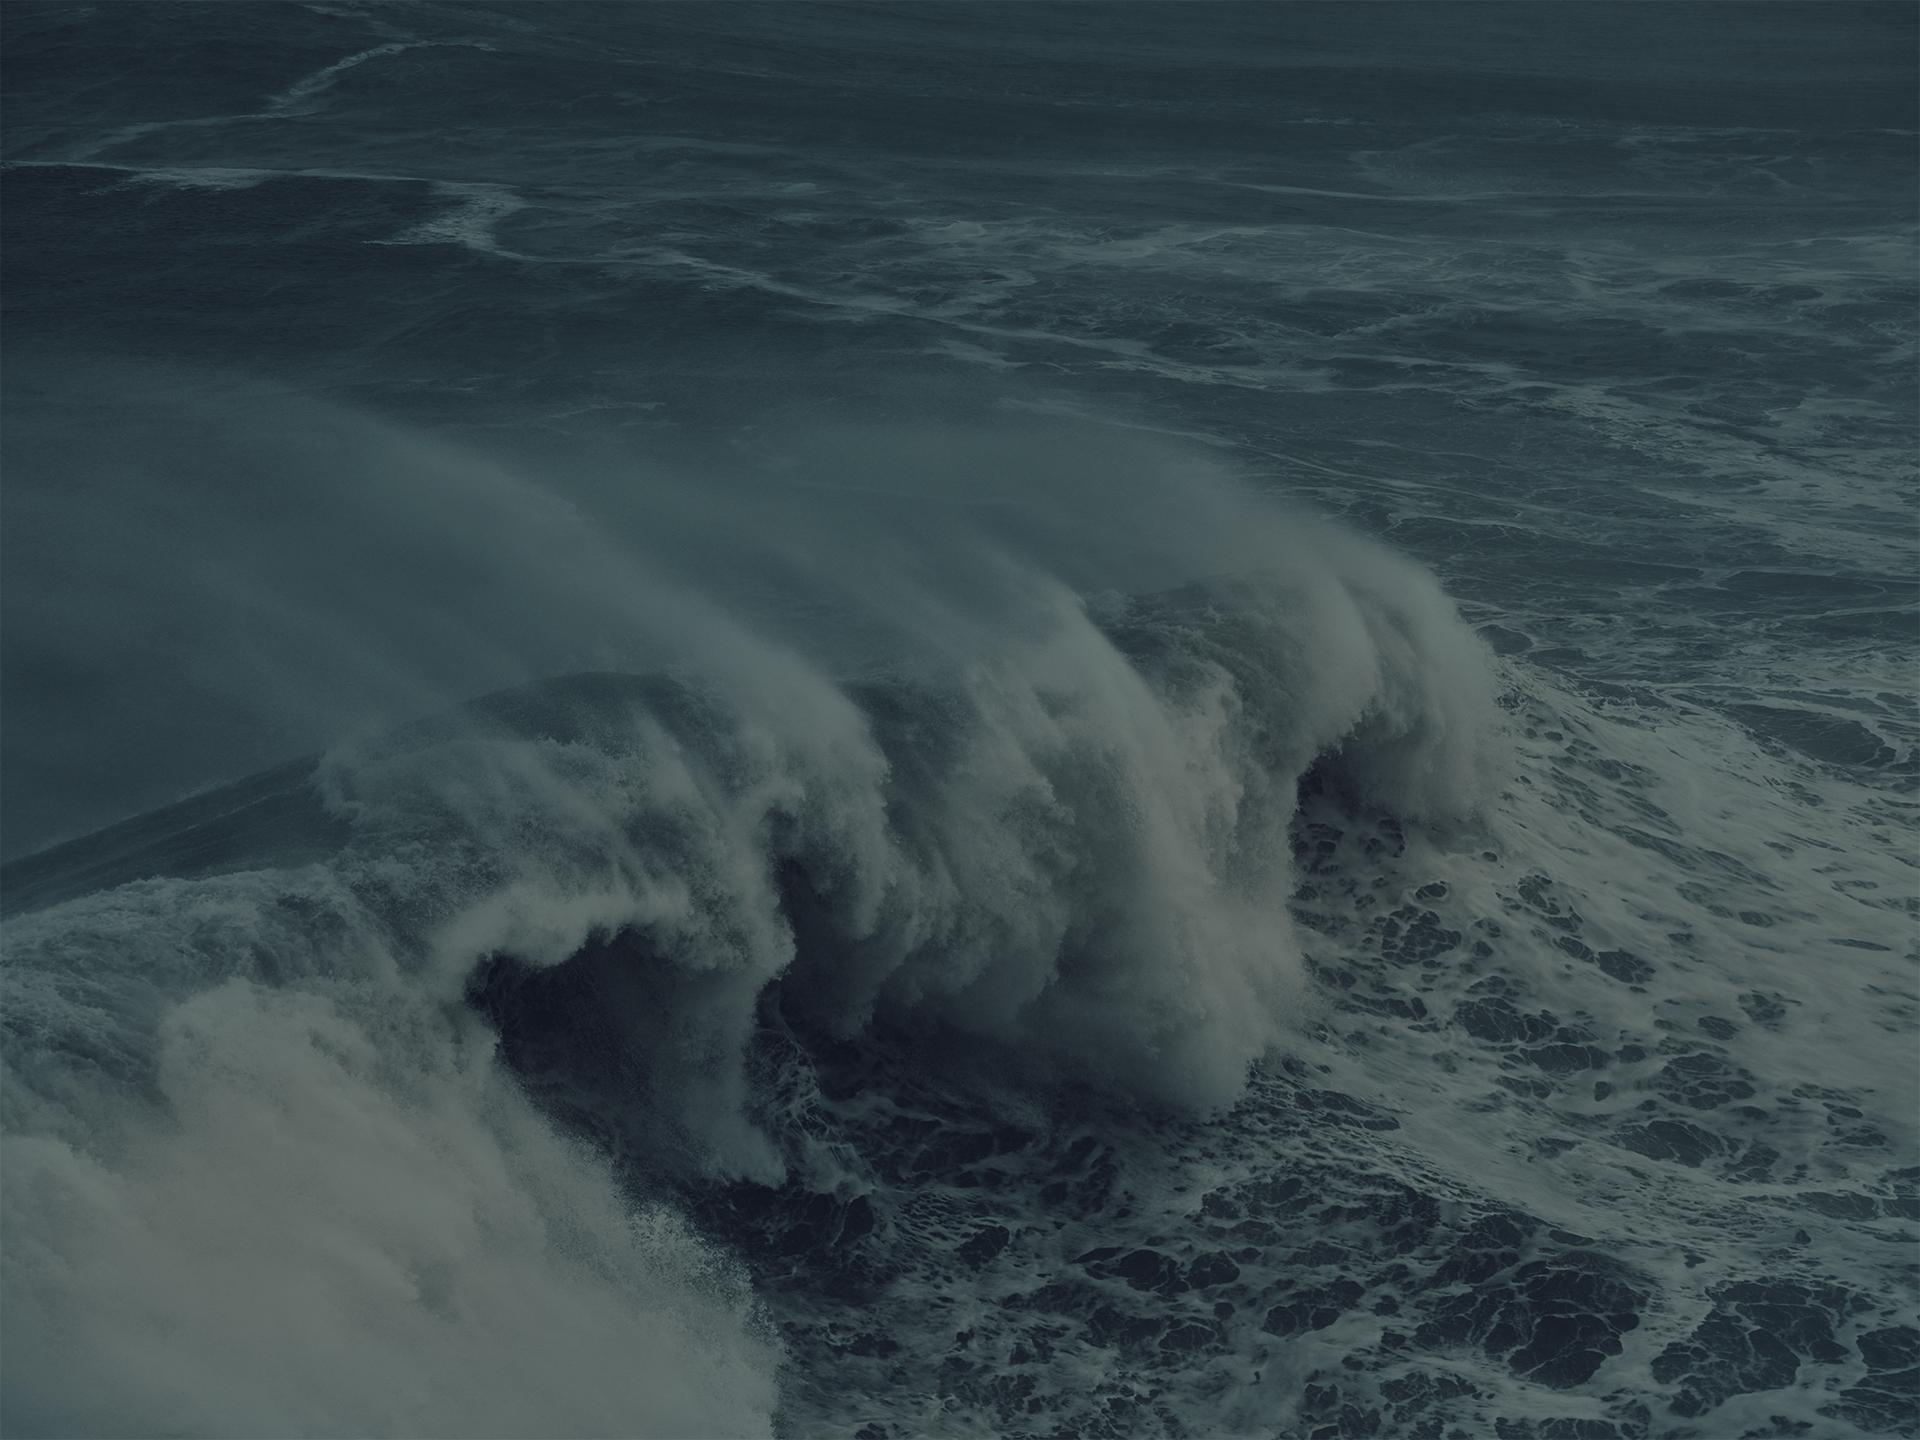 wellen, waves, landscape, water, sea, anke luckmann, nazare, portugal